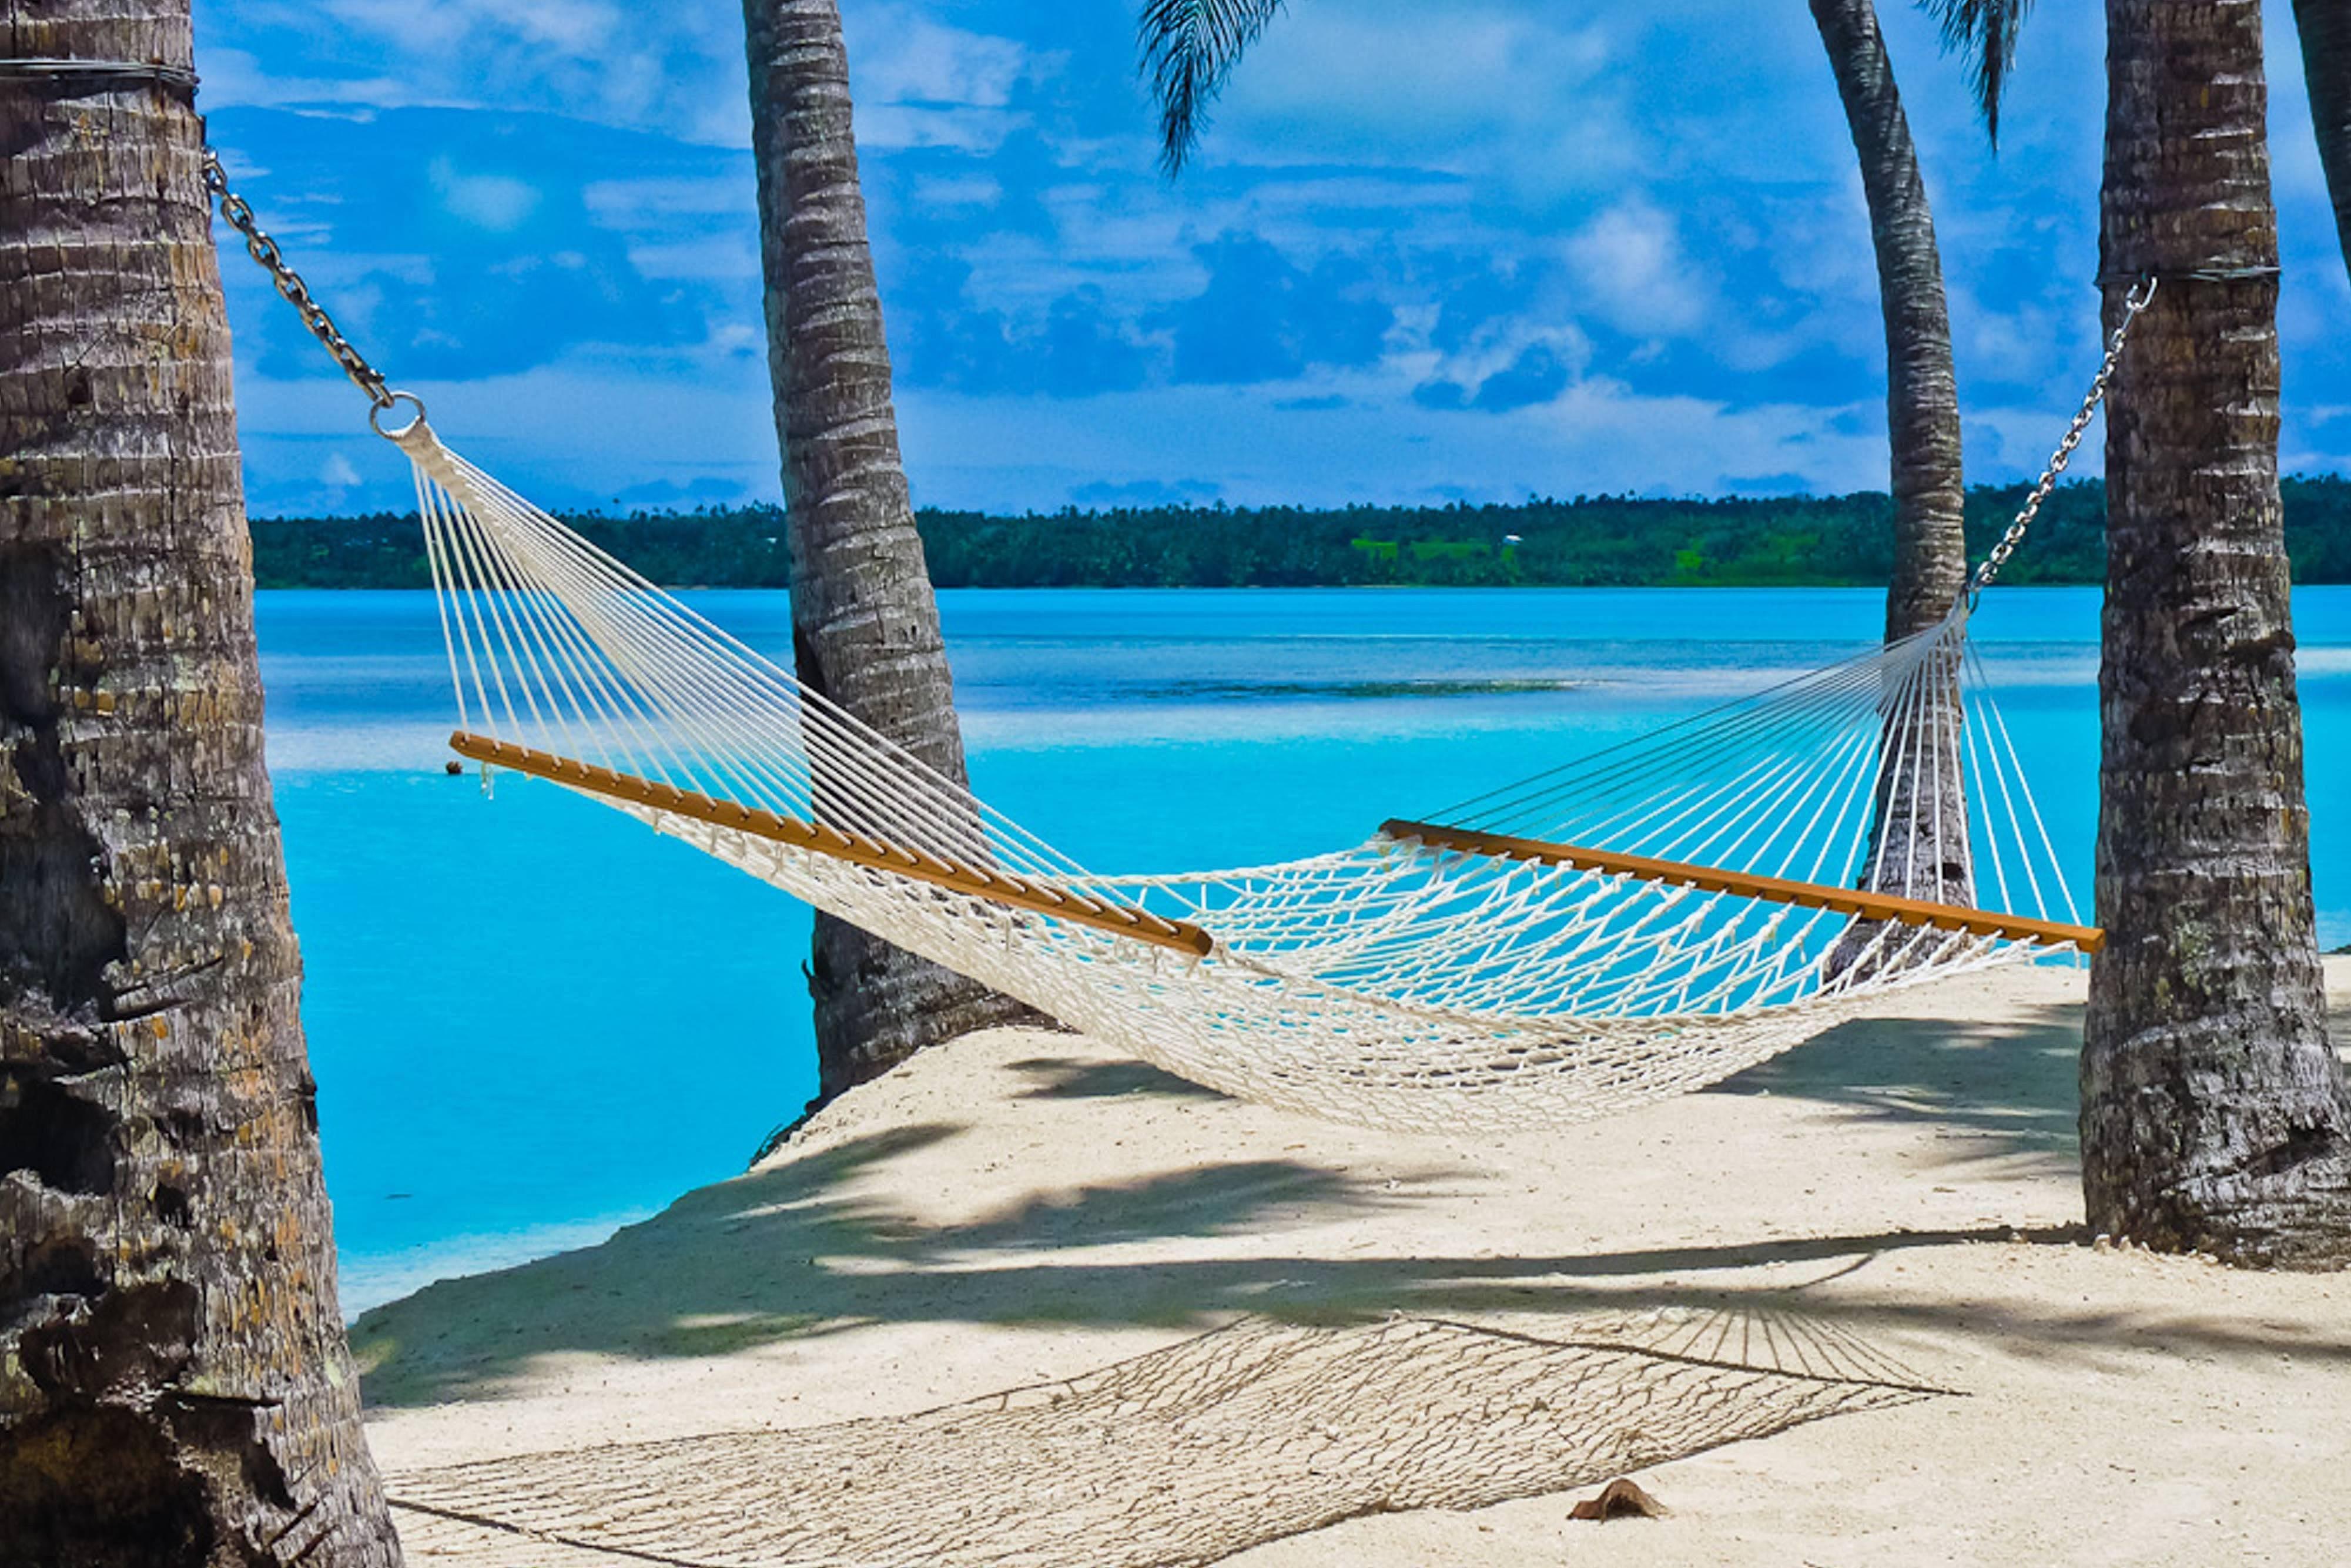 Beautiful Beach Hammock Backgrounds Hd Images 3 Hd